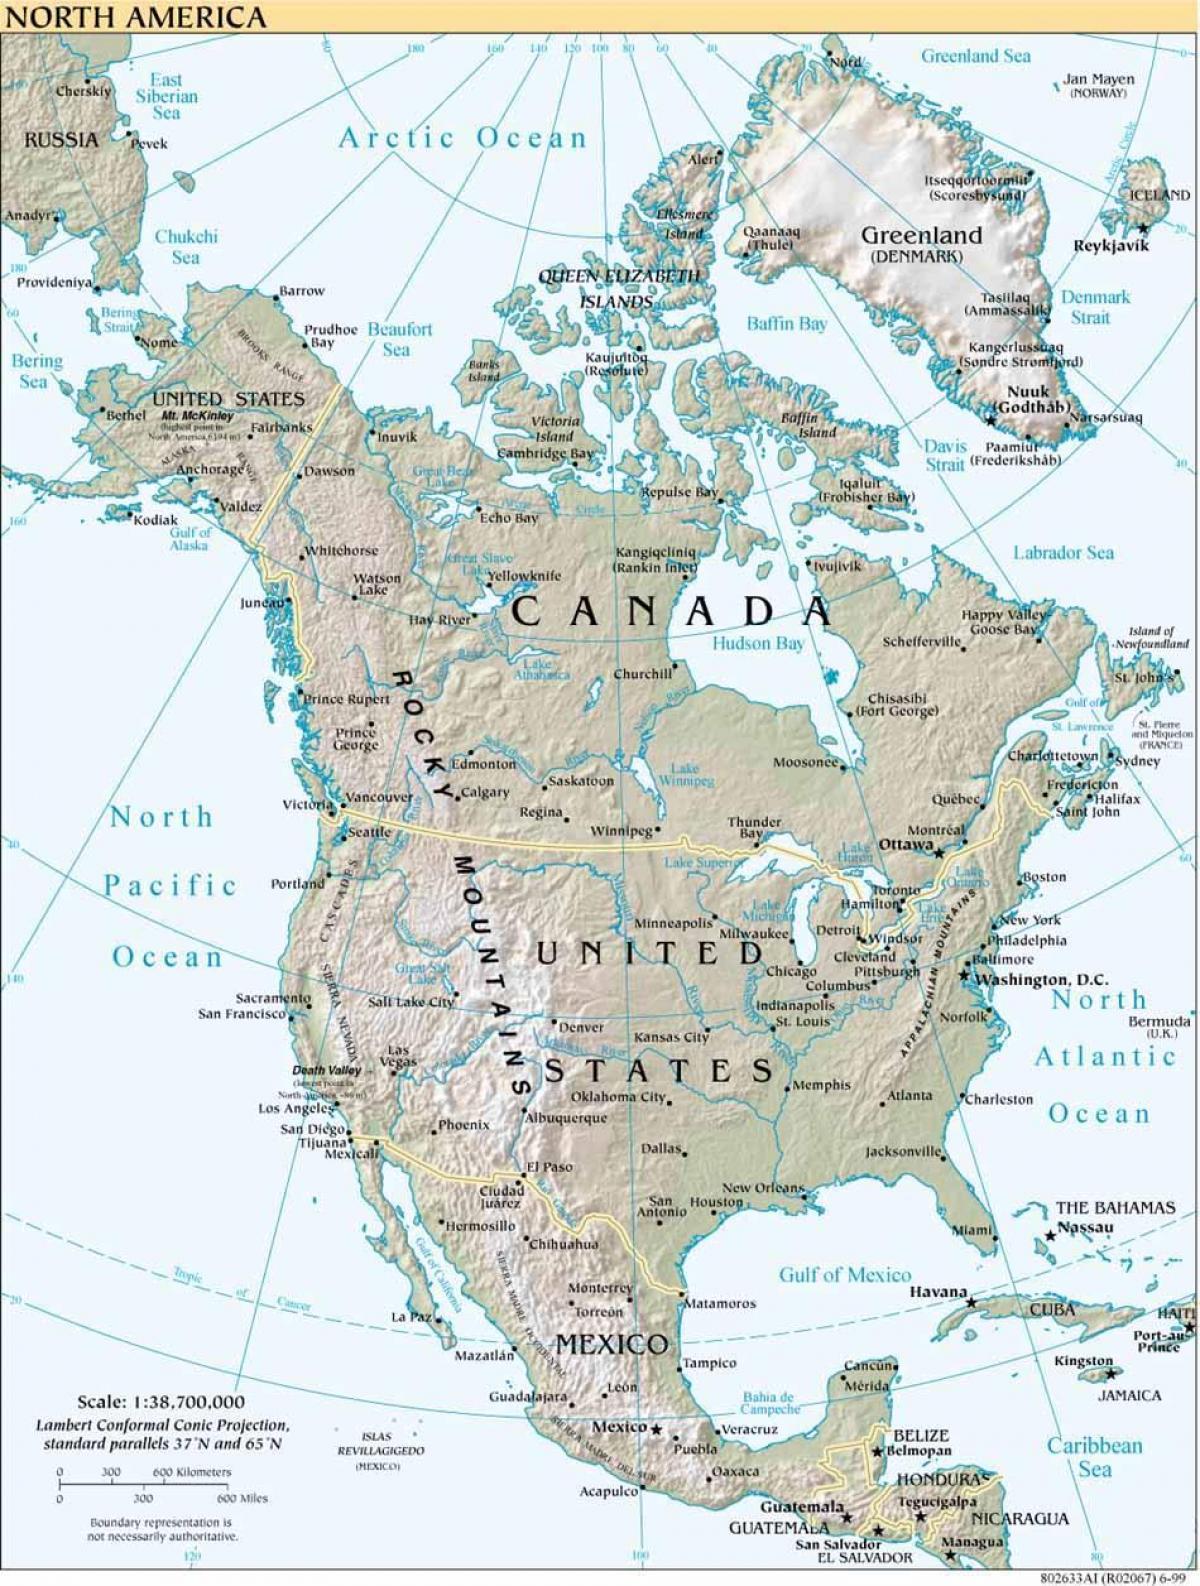 Karte Südamerika Und Nordamerika.Us Gewässern Anzeigen Gewässern Des Us Karte Nordamerika Und